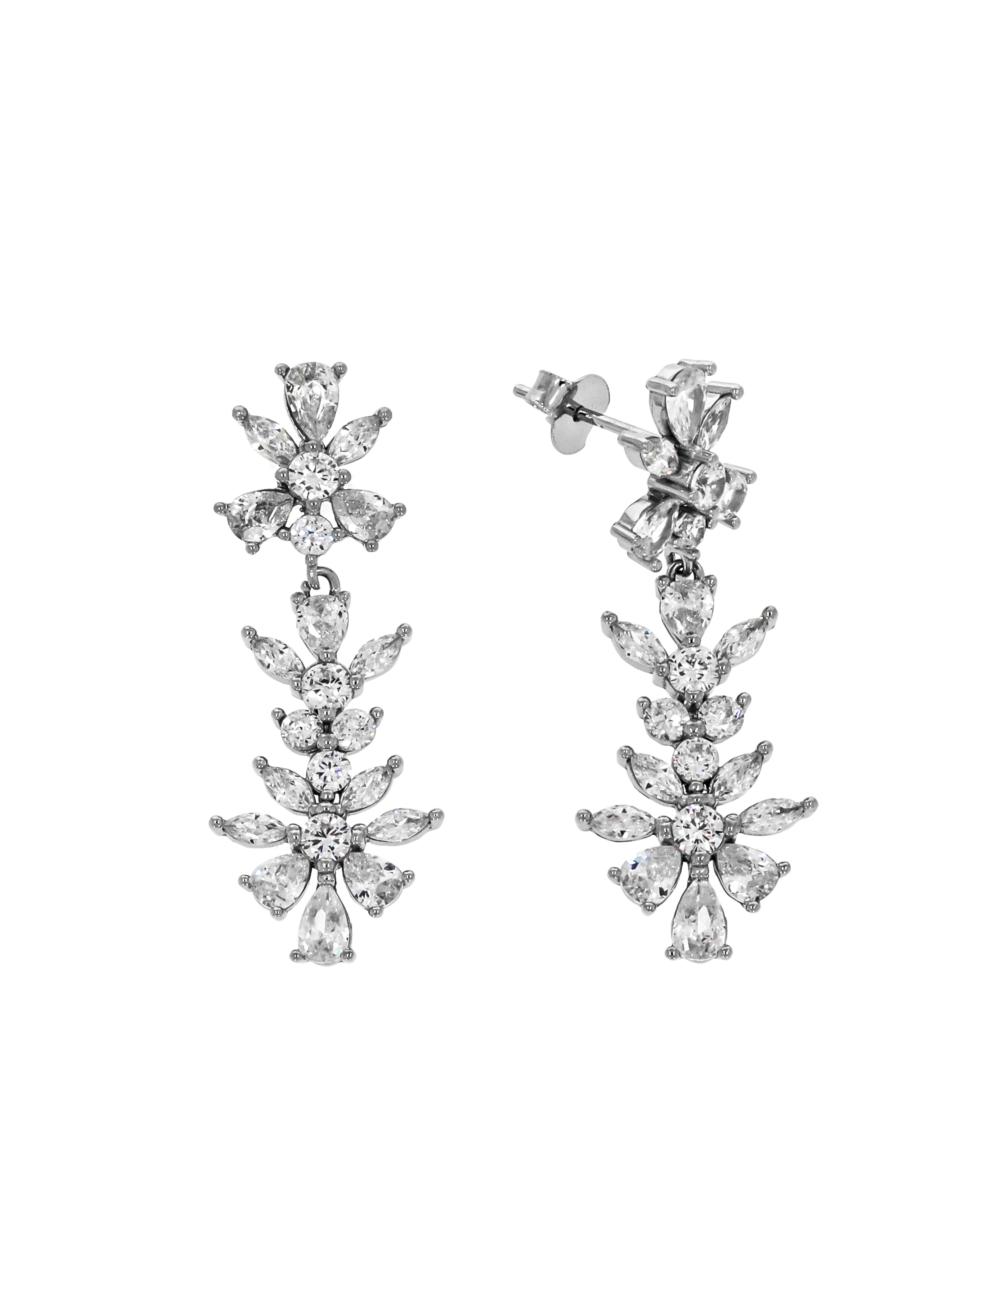 10014681 Kolczyki srebrne pr.925 z cyrkoniami